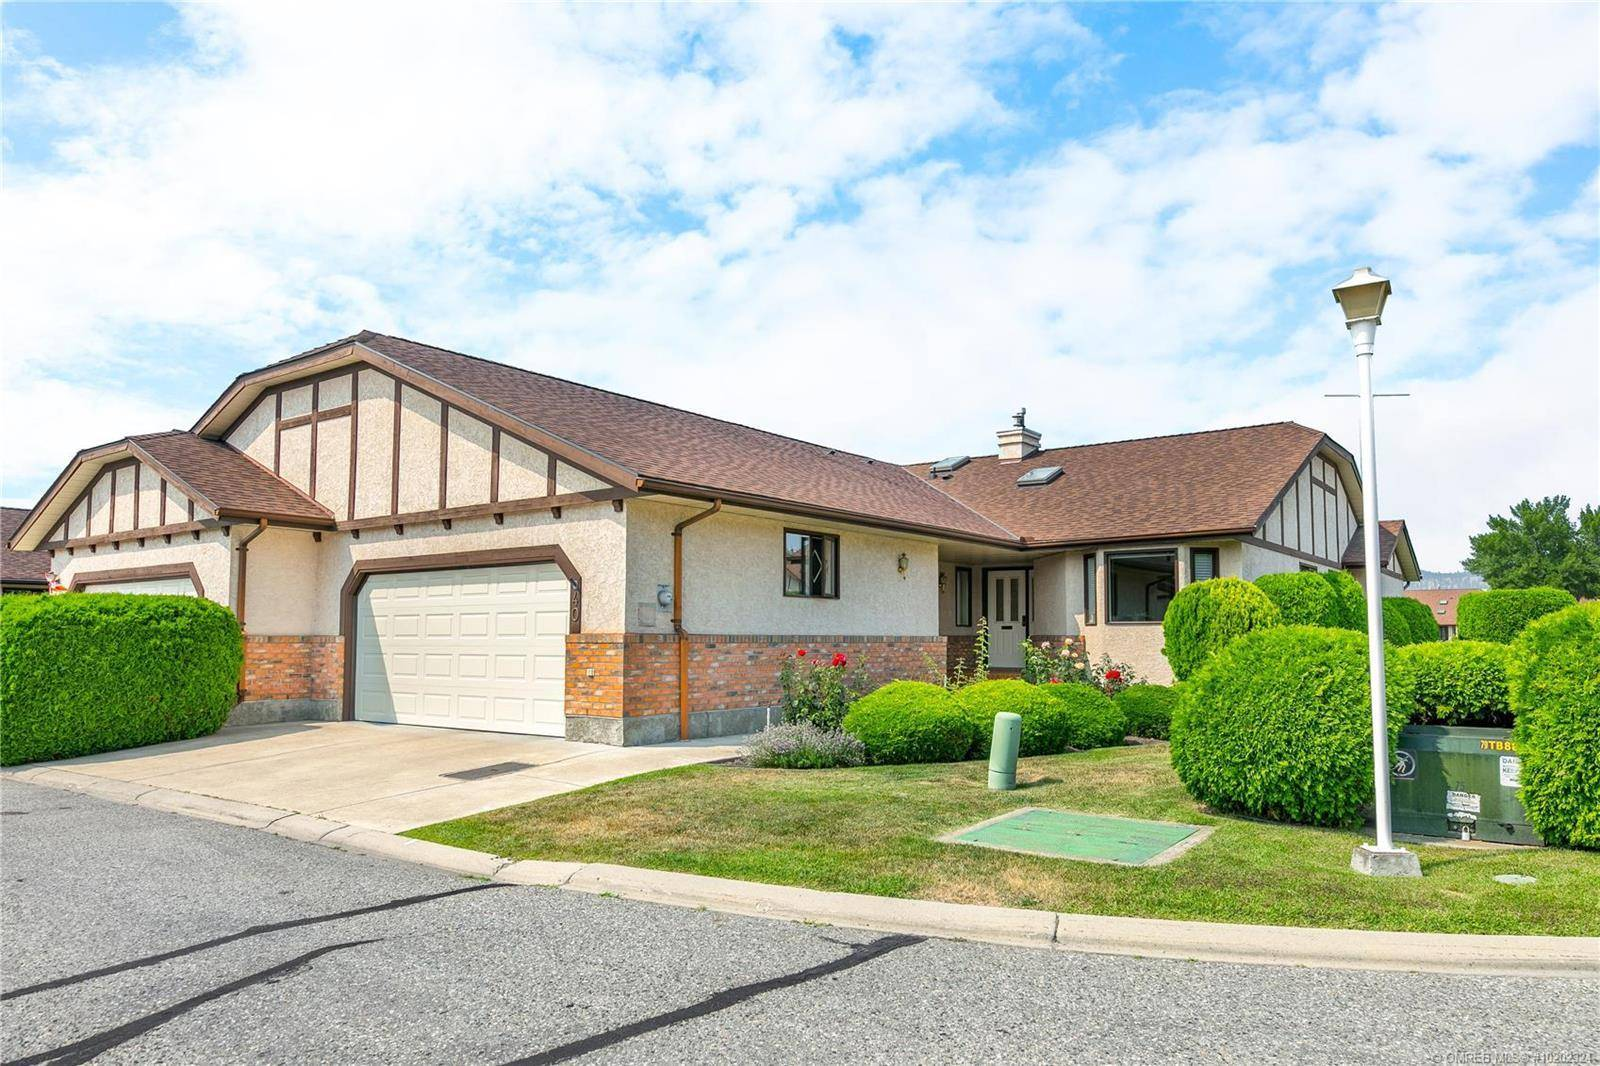 Townhouse for sale at 2200 Gordon Dr Unit 40 Kelowna British Columbia - MLS: 10202324